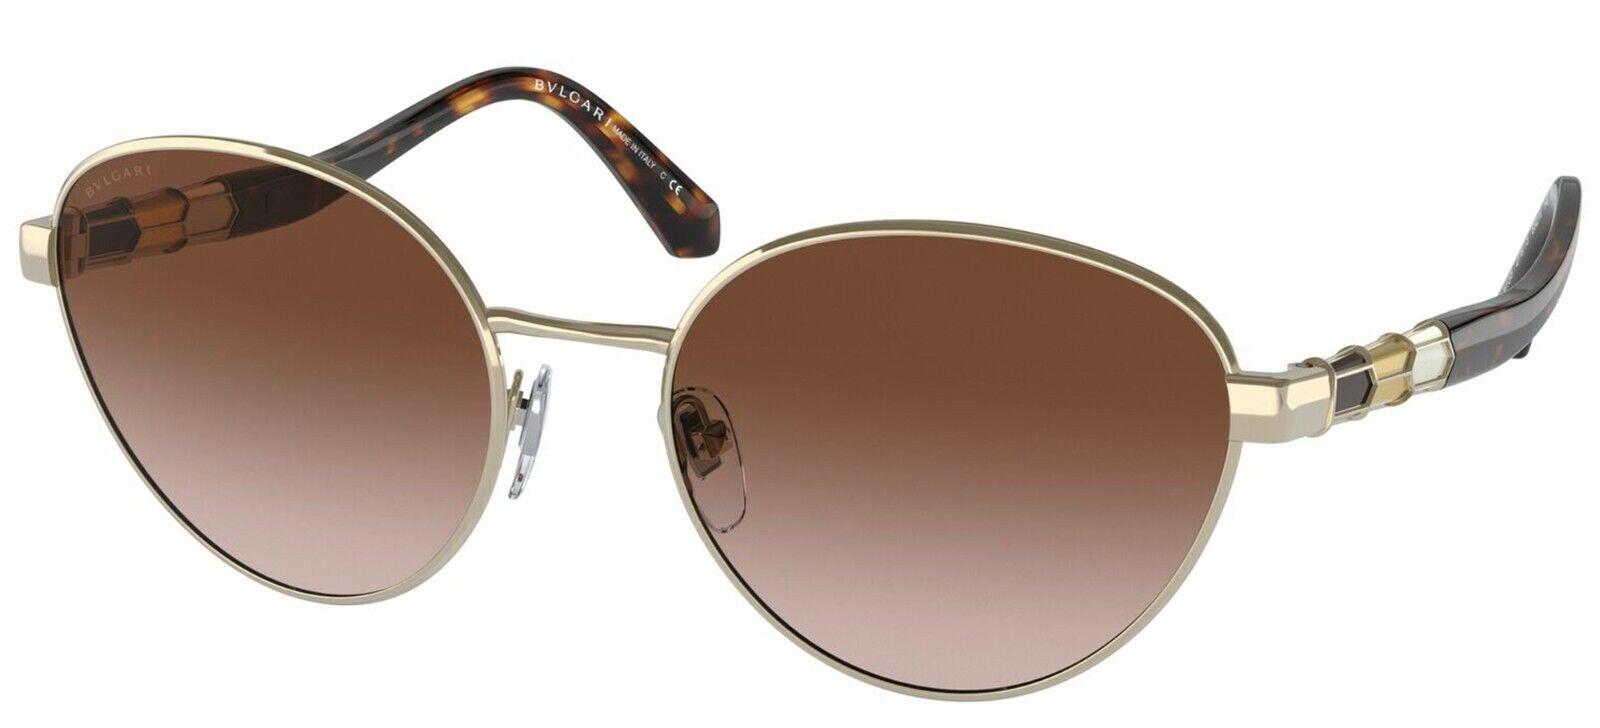 Bvlgari SERPENTI BV 6155 Pale Gold/Brown Shaded (278/13) Sunglasses